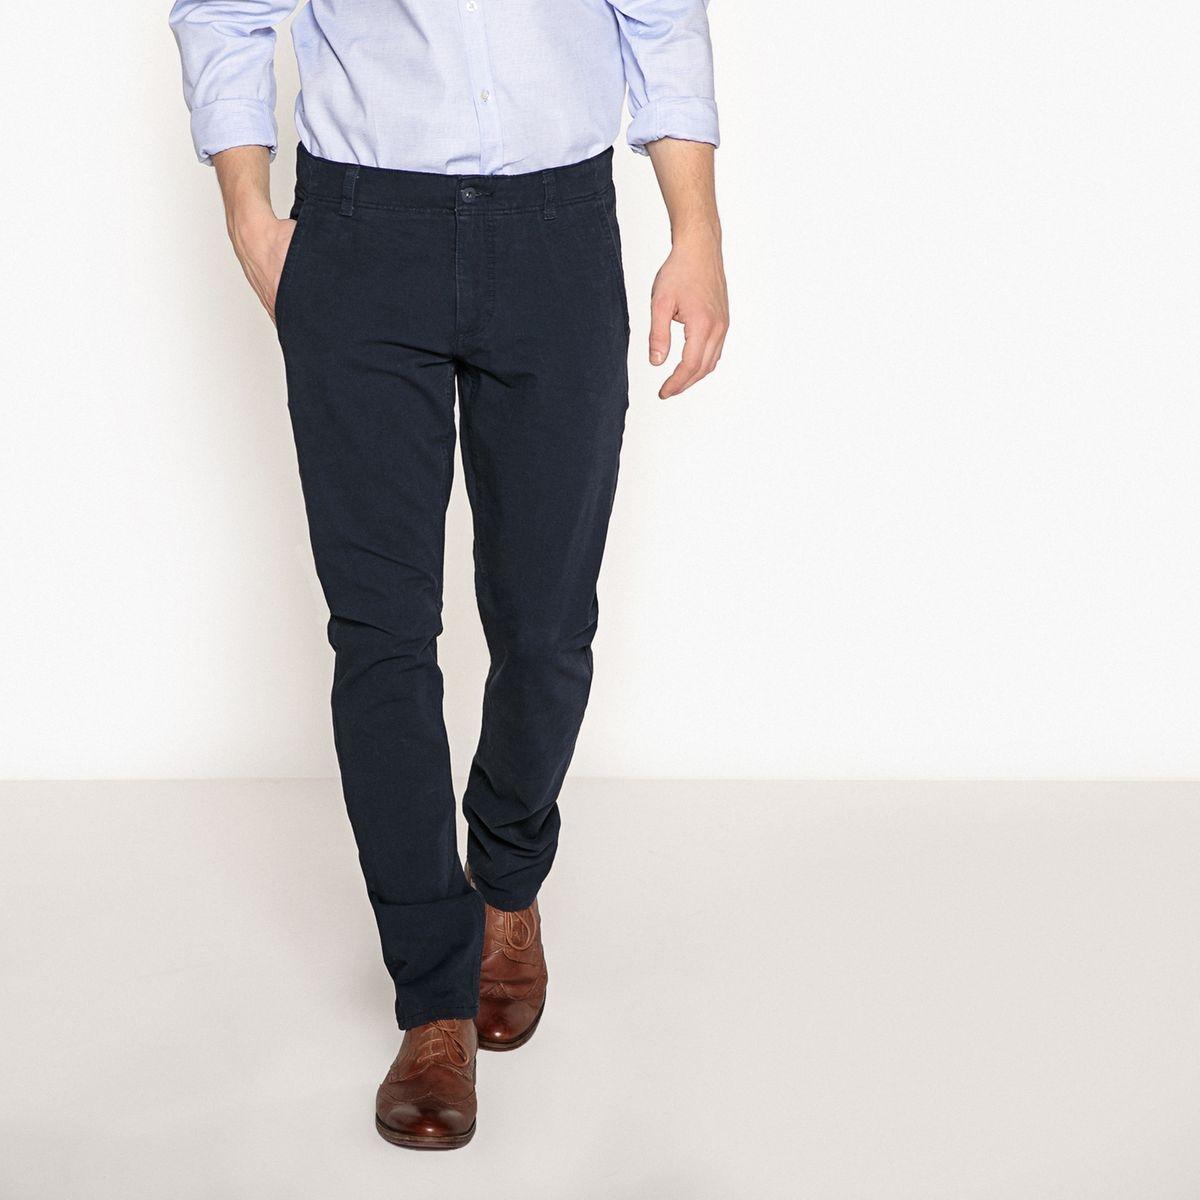 Pantalon chino skinny taper stretch SMART 360 FLEX